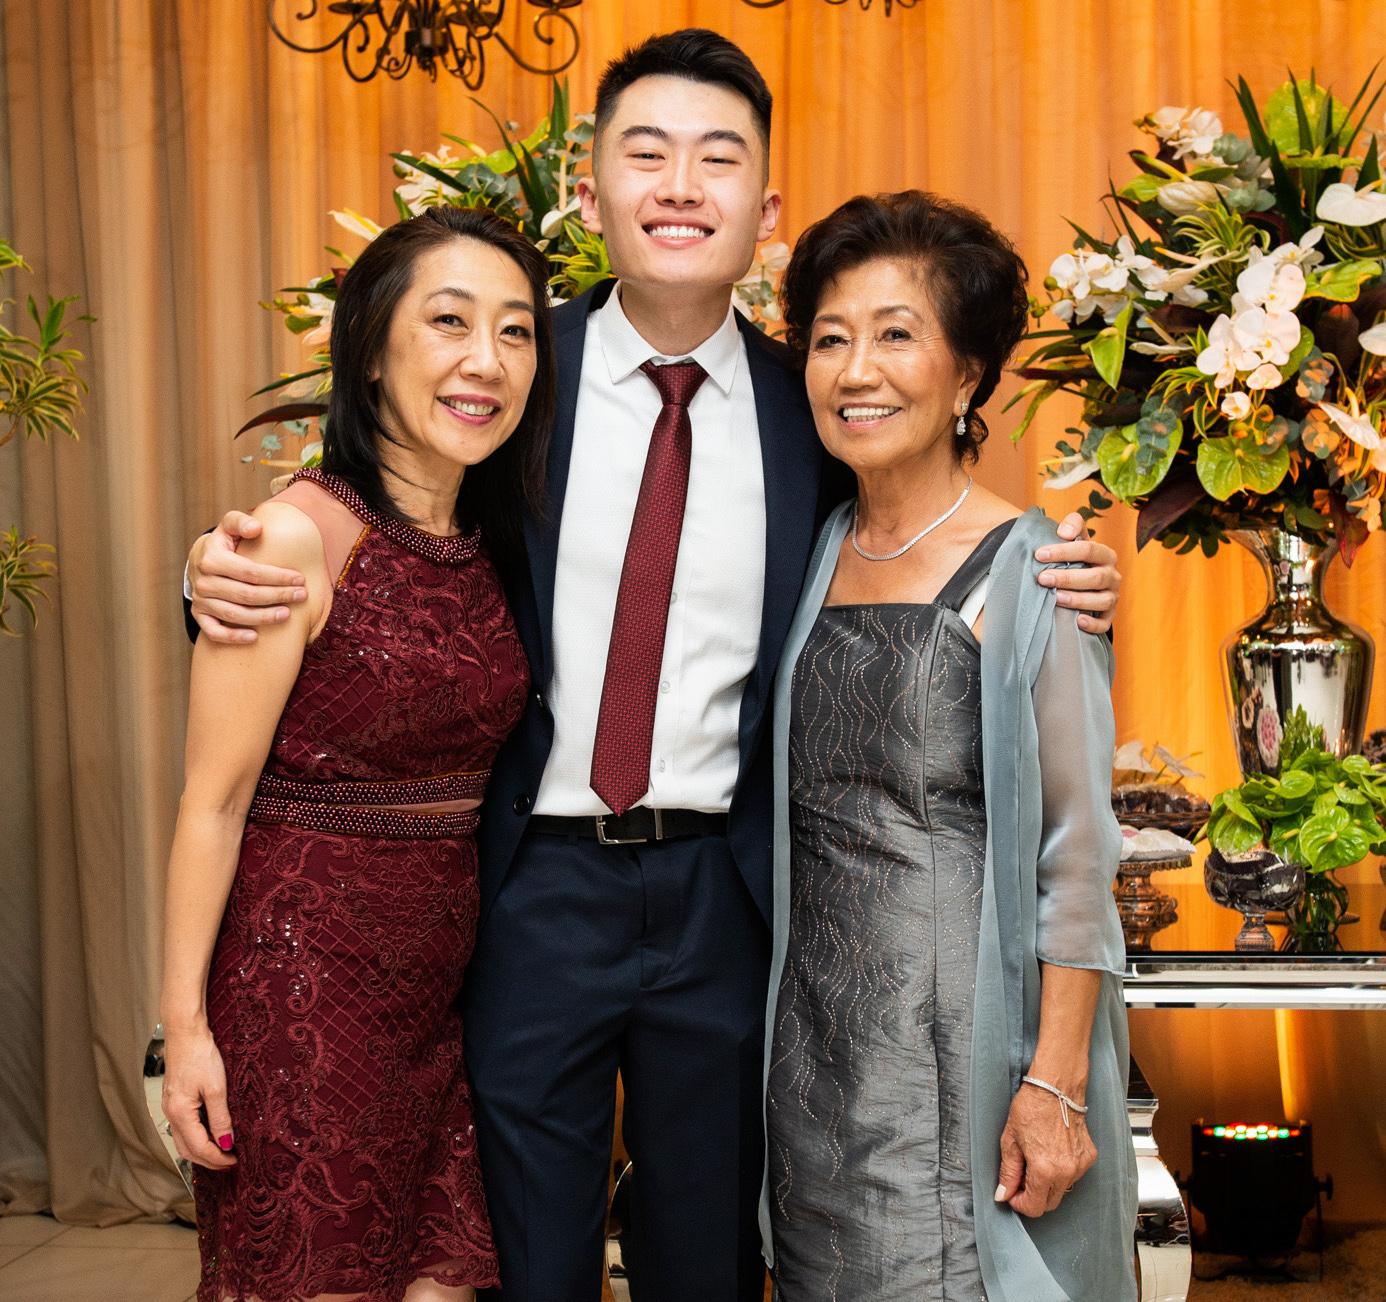 Yoshiaki com a mãe Angela Miyuki Yamamoto e a avó Toyoko Yamamoto